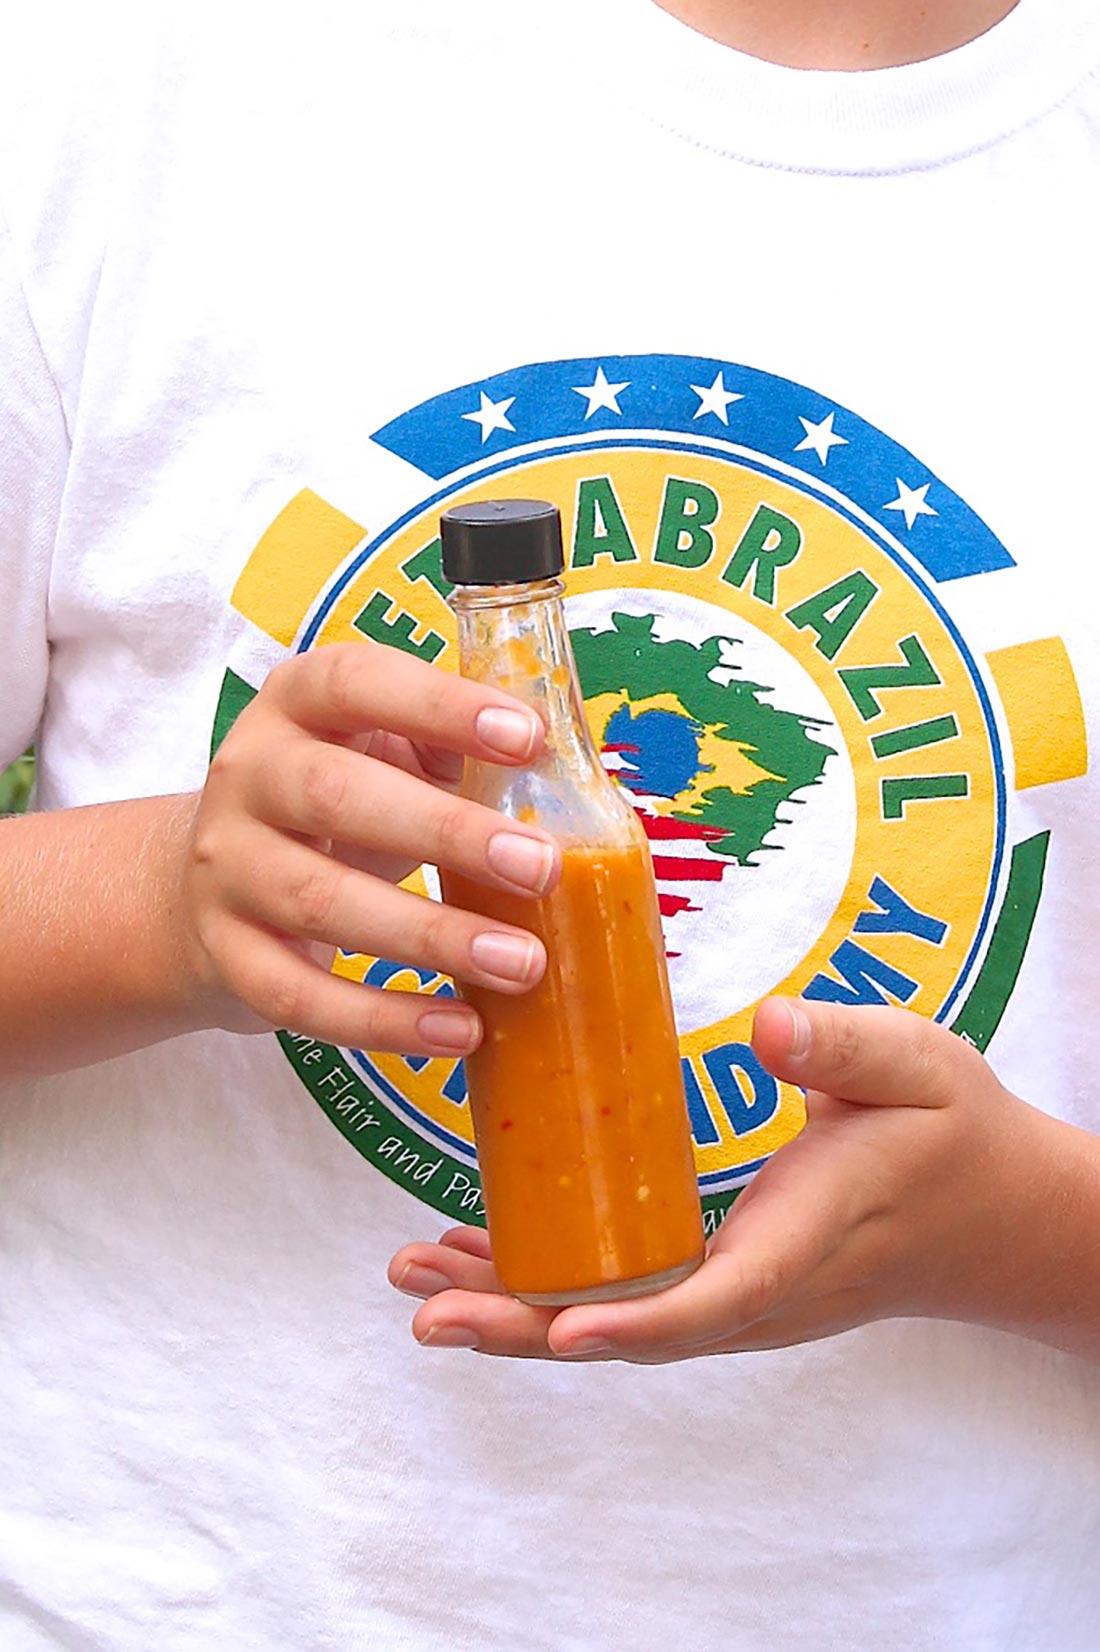 William's Habanero Hot Sauce